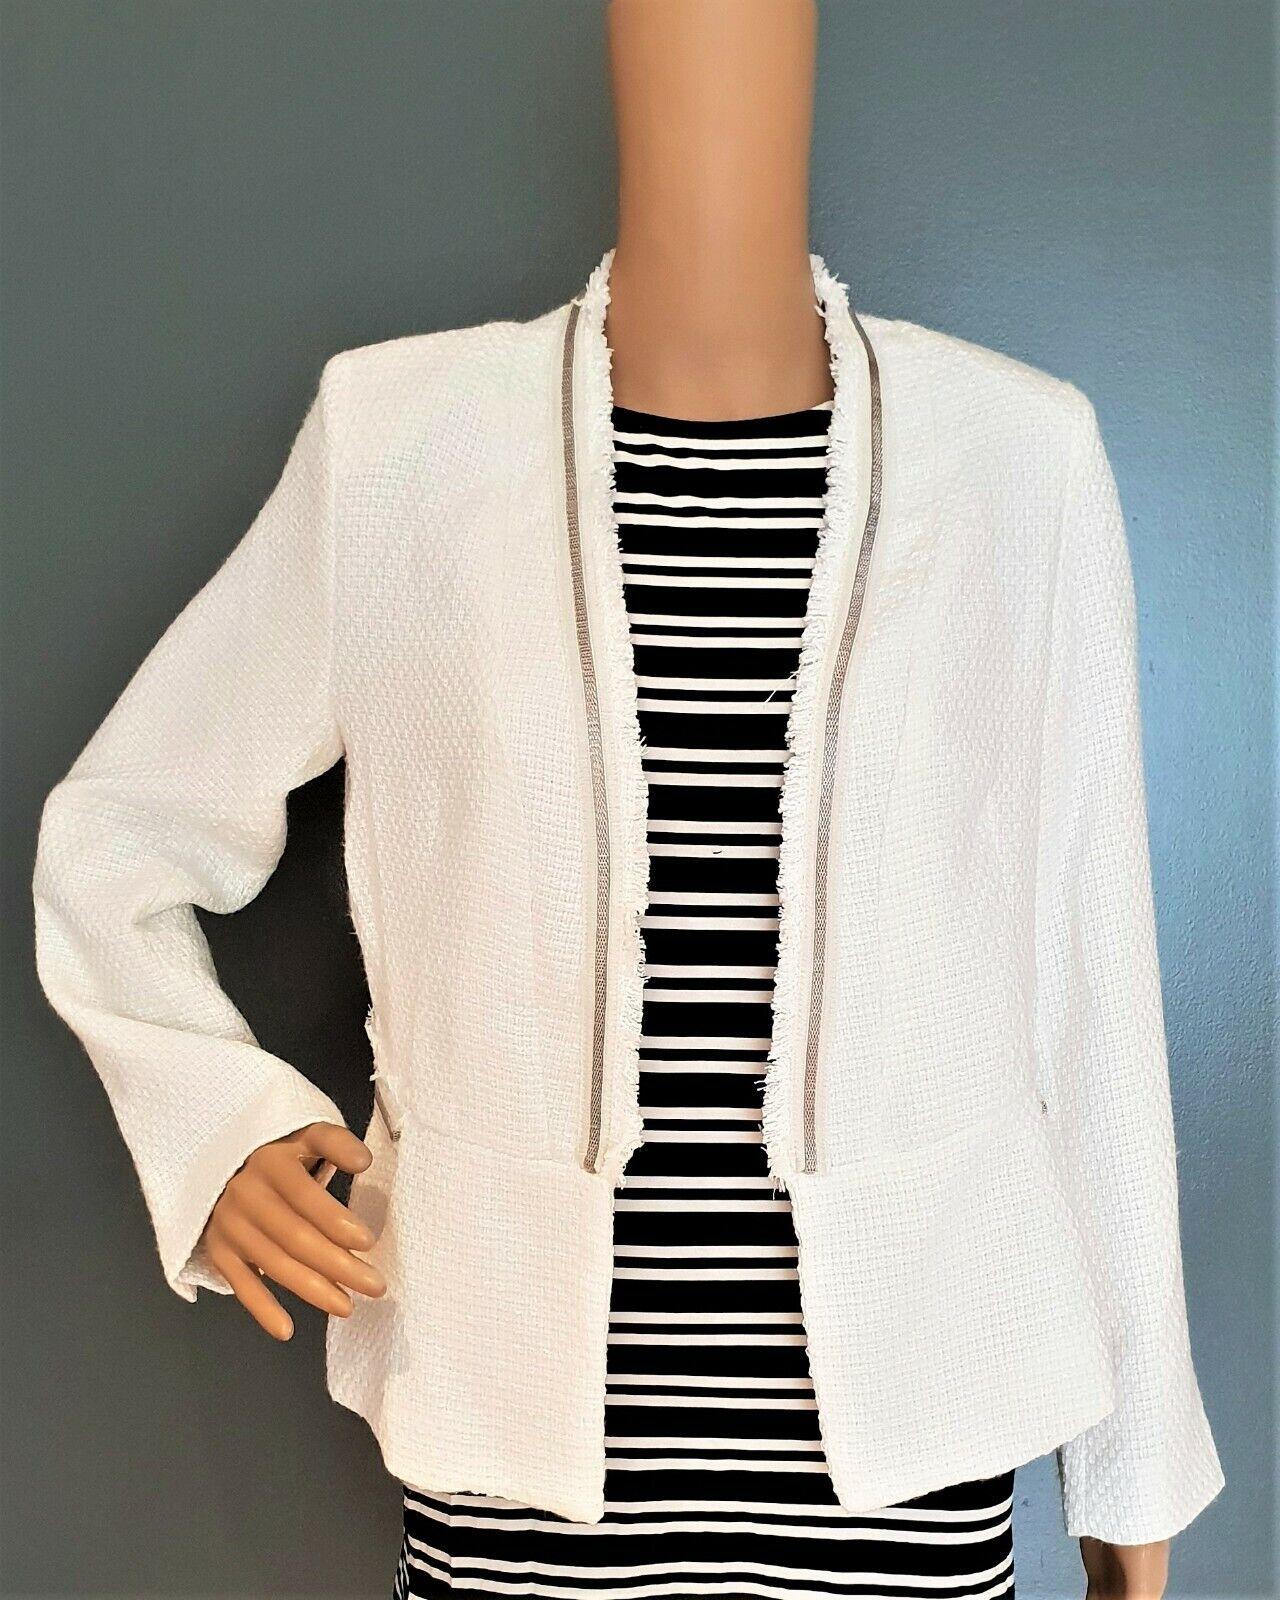 Women's Tailored Open Front Tweed White Blazer Size XL